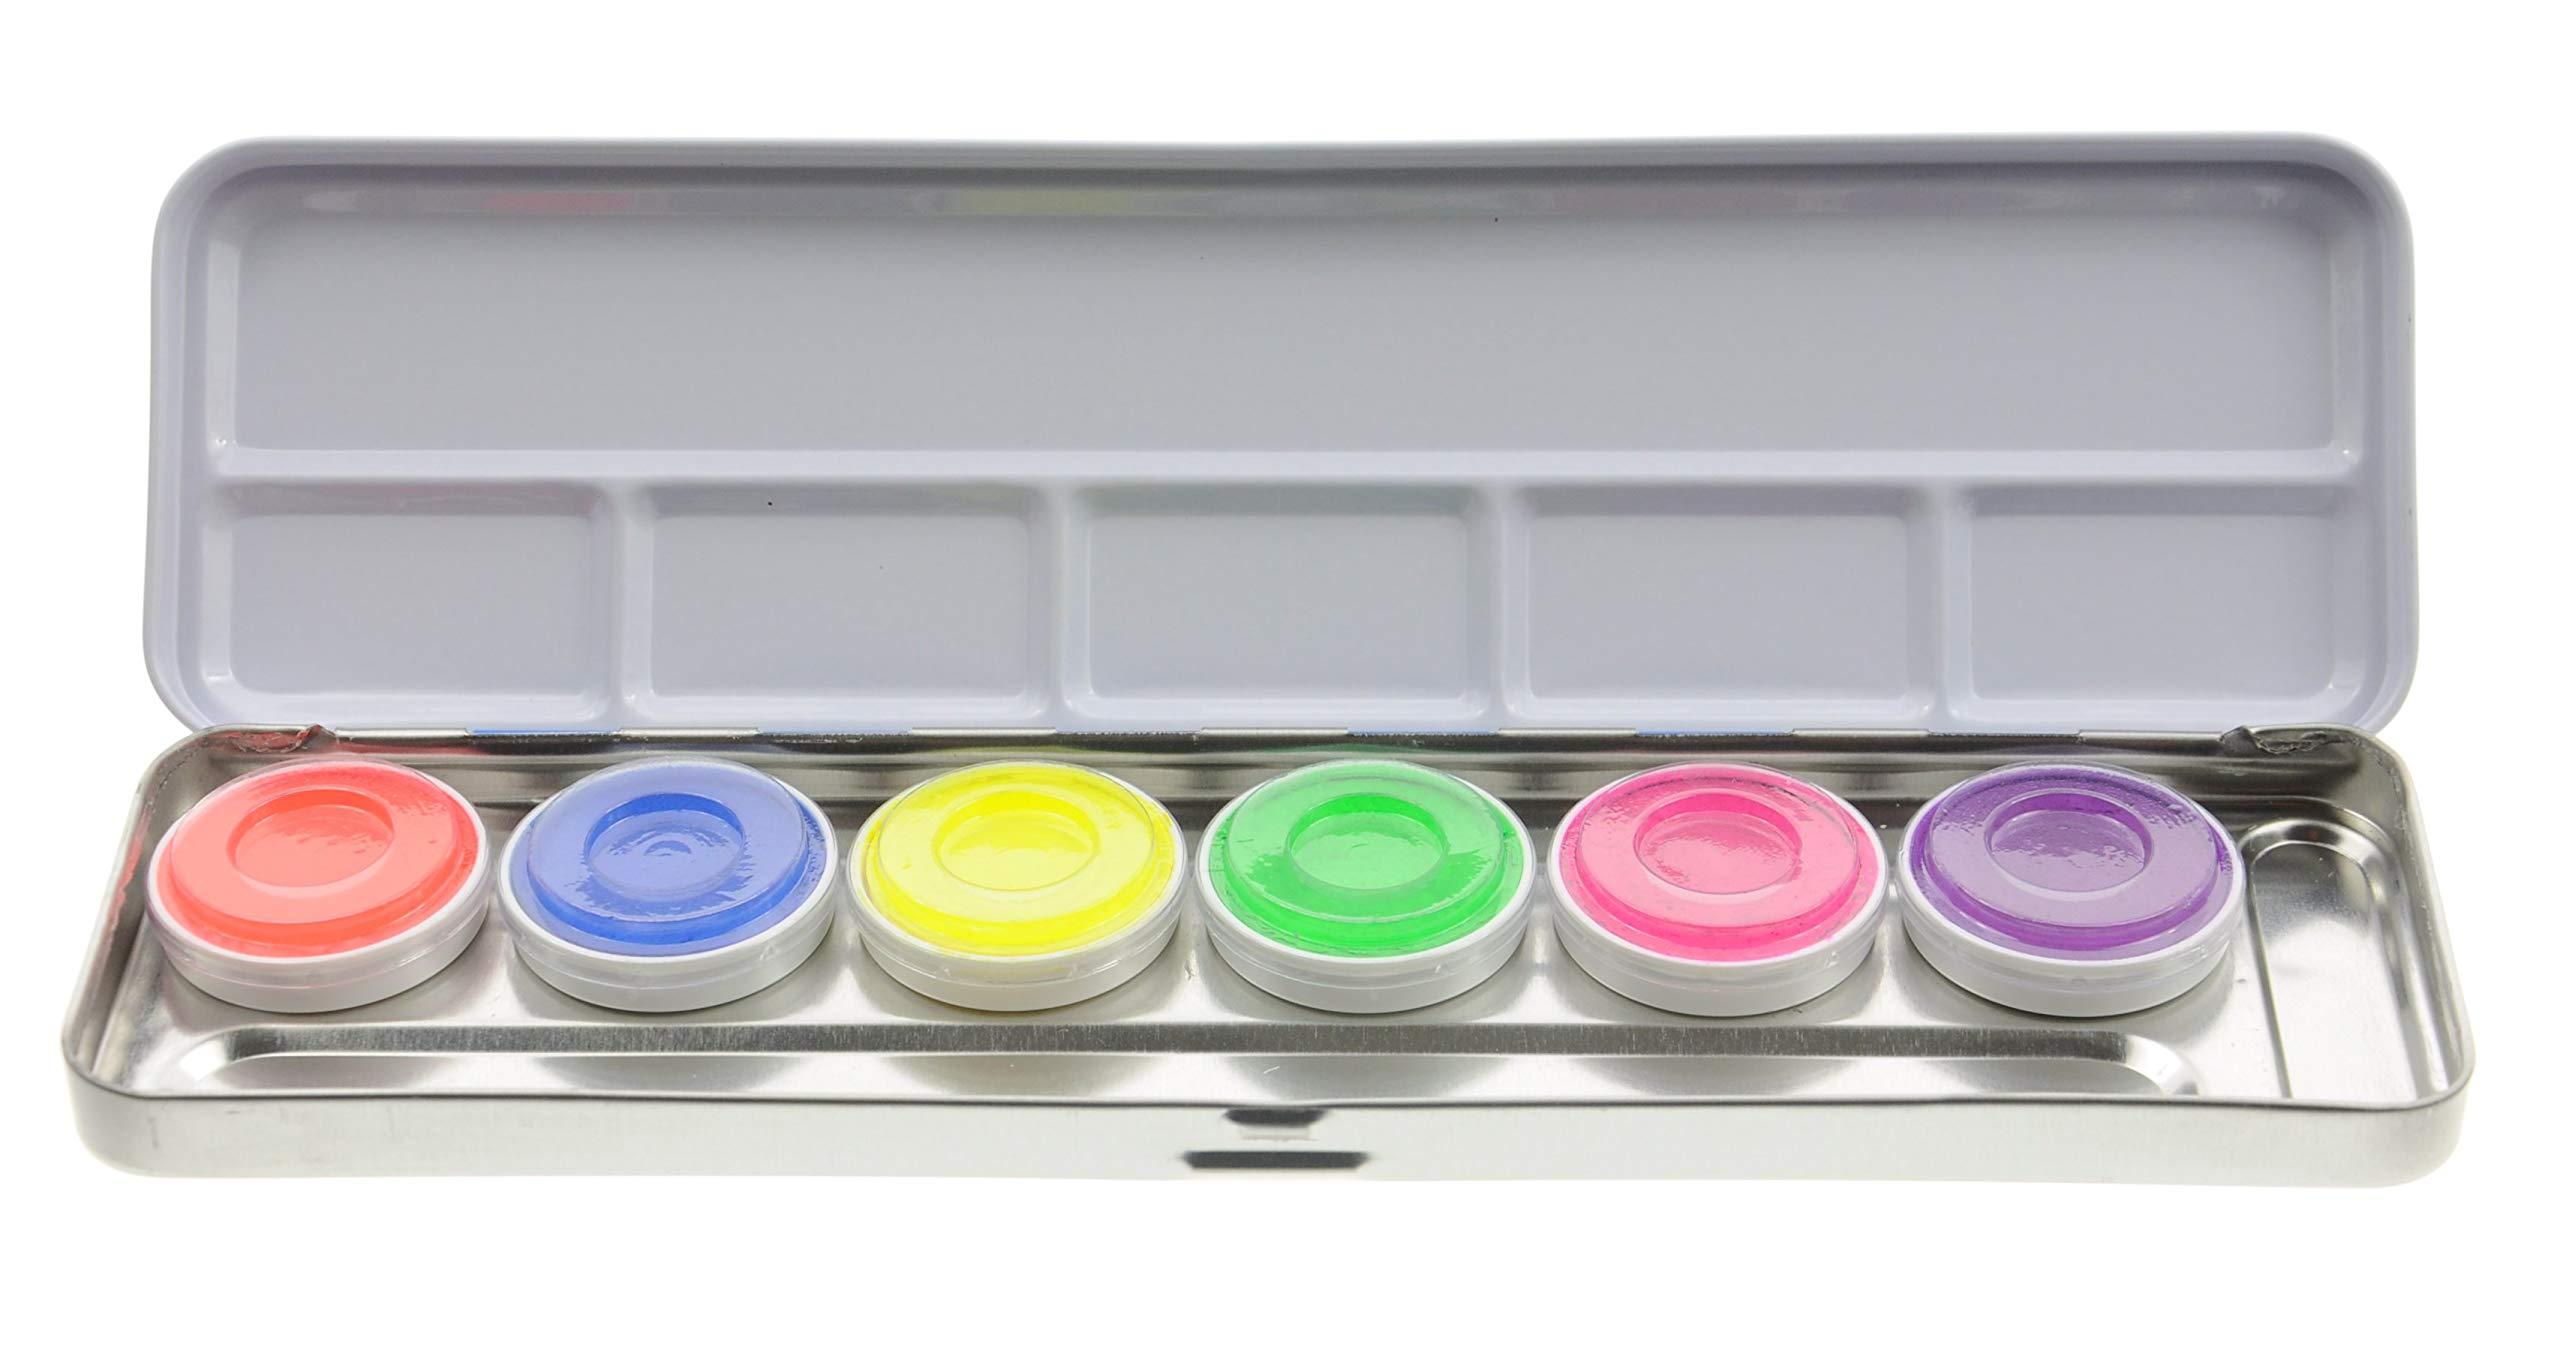 Kryolan AQUACOLOR DAY GLOW PALETTE 6 COLORS 5177 UV-Dayglow Makeup